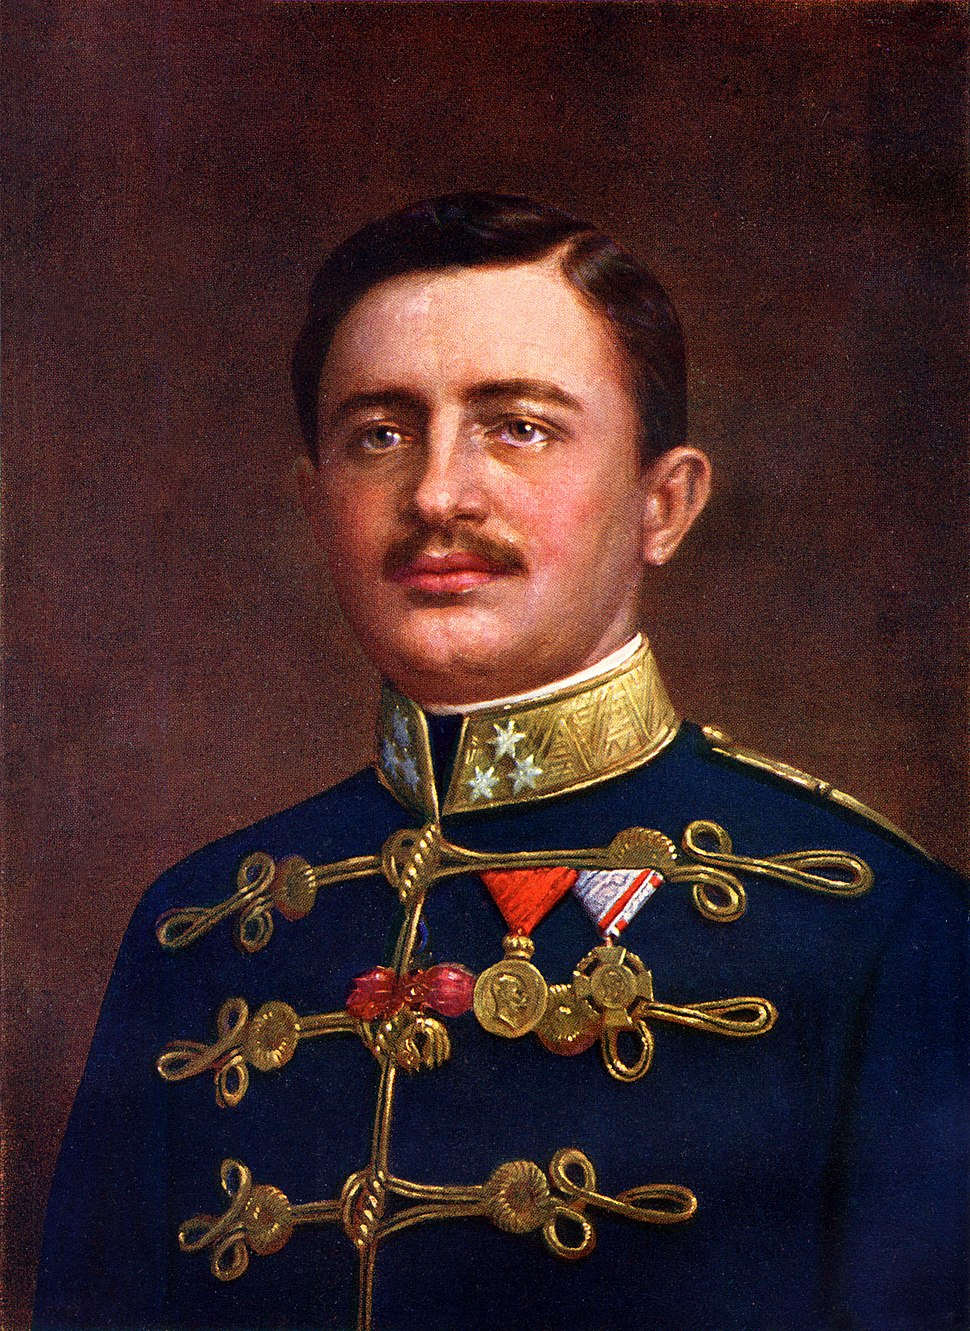 Erzherzog Thronfolger Karl Franz Josef